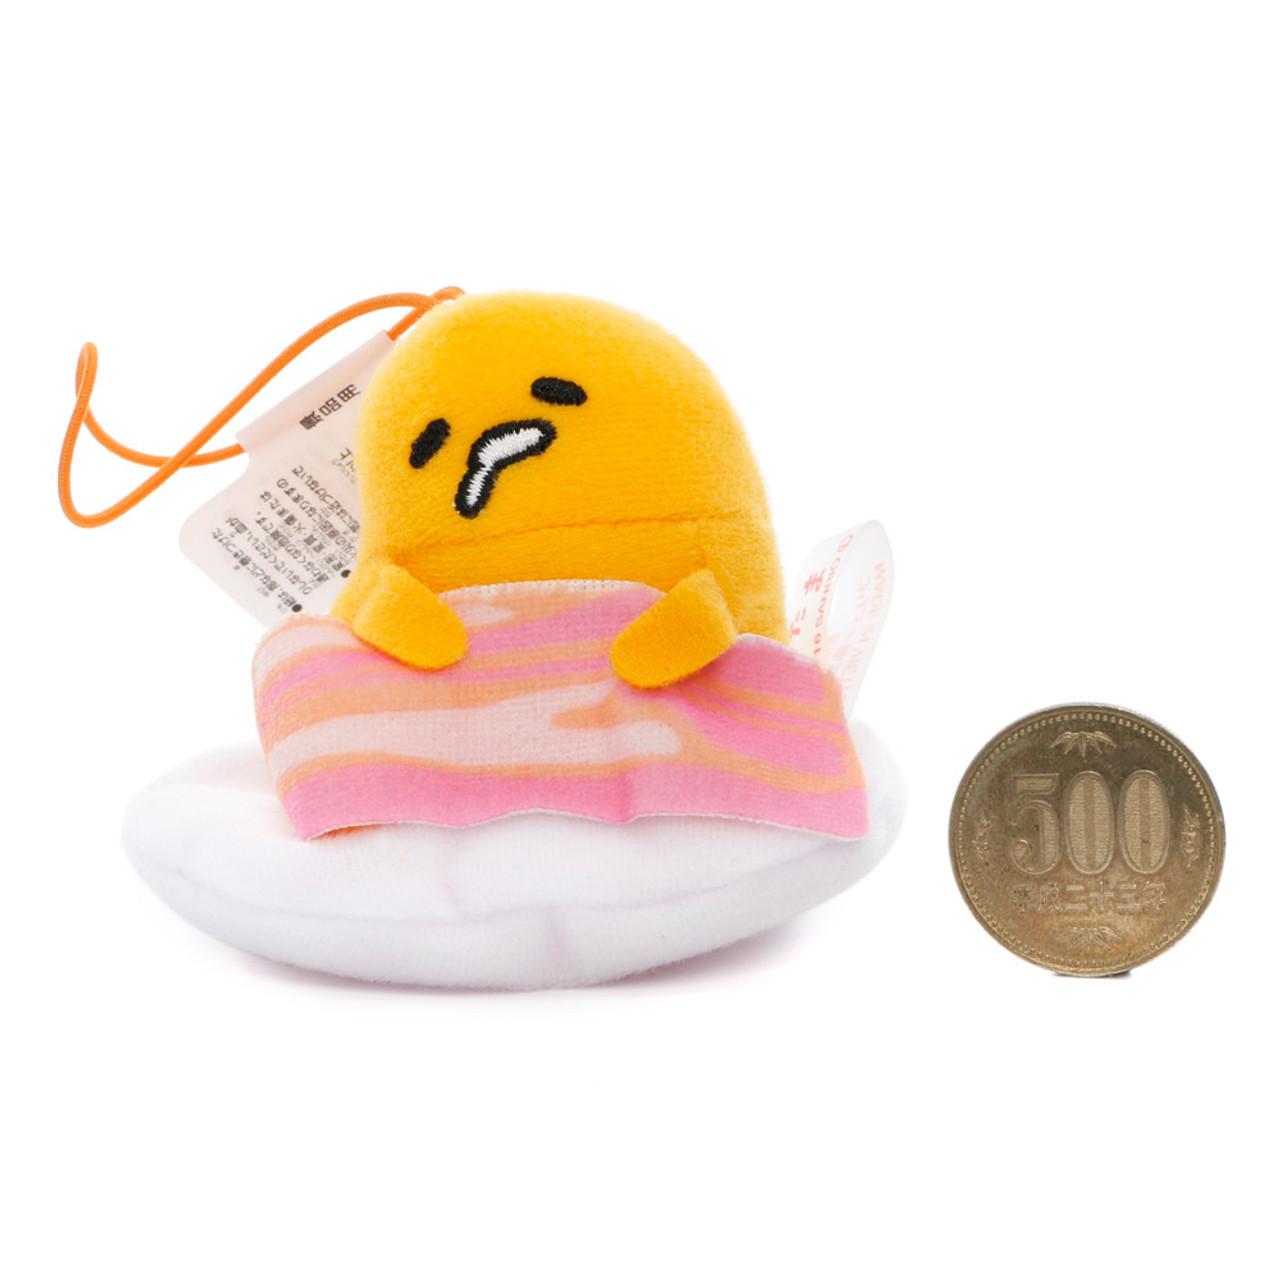 Sanrio Gudetama Lazy Egg Sleeping Mascot Plush Charms - Bacon ( Proportion )